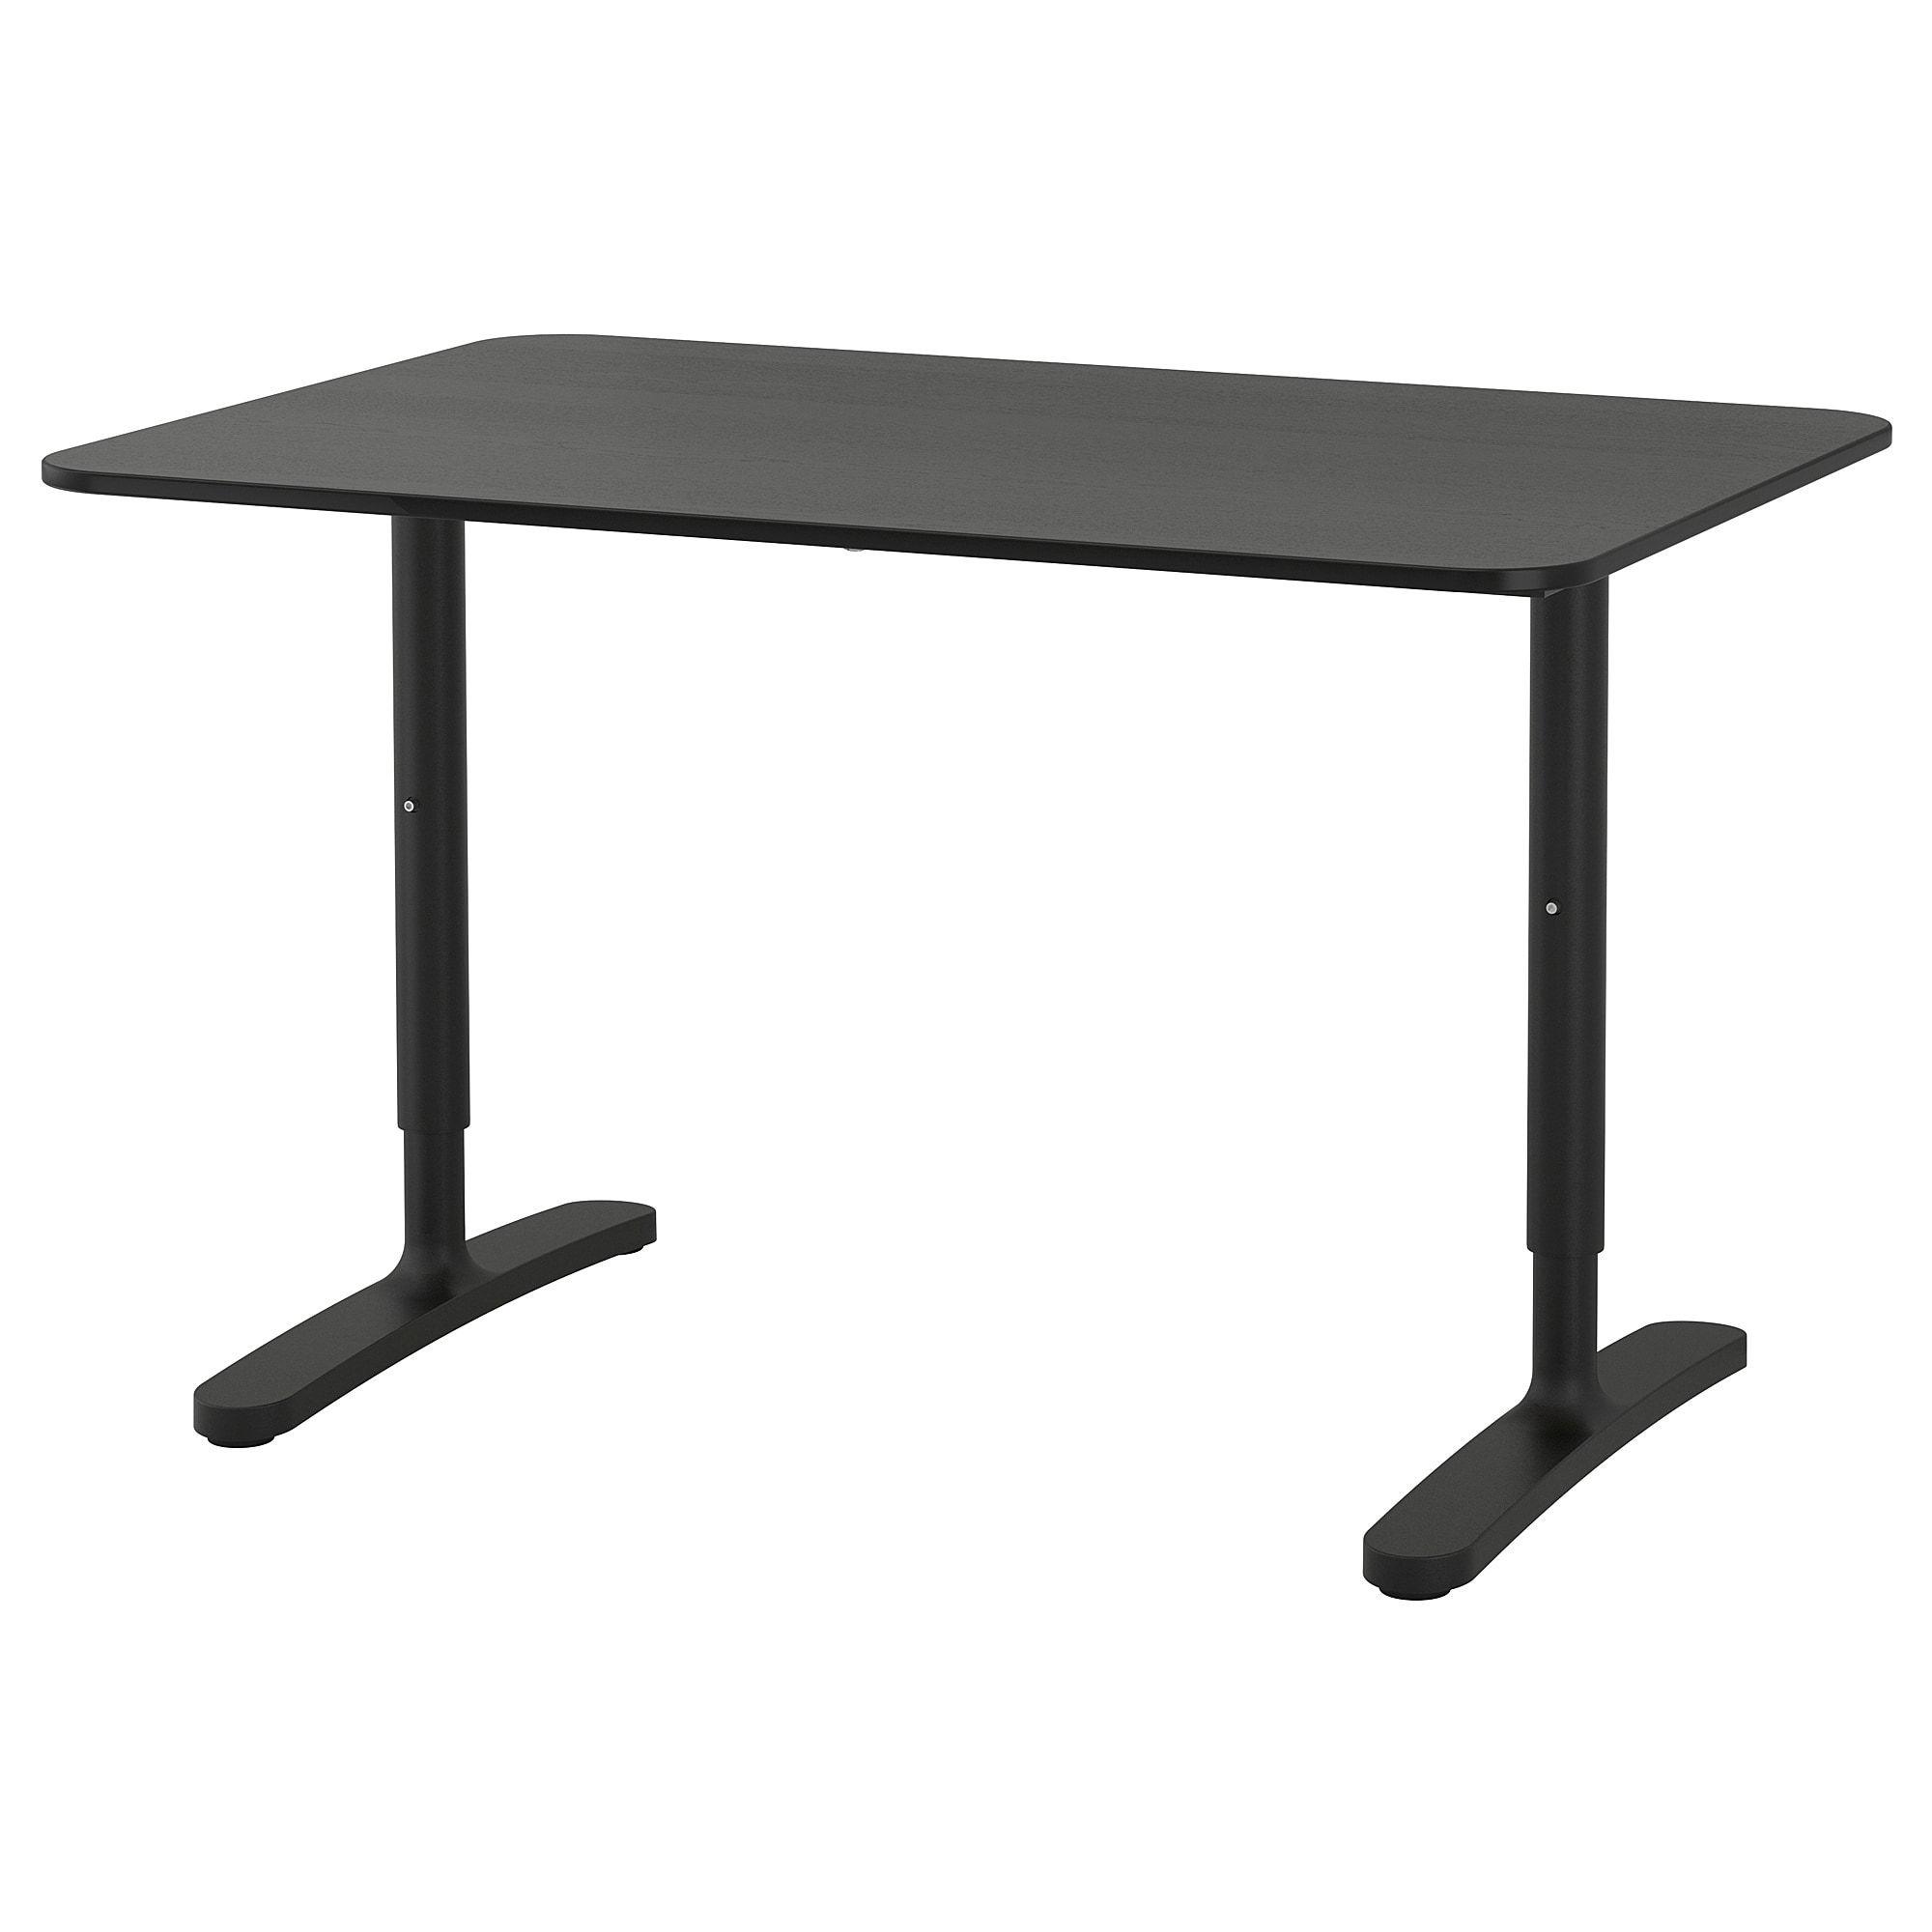 Ikea Bekant Desk Black Stained Ash Veneer Ikea Bekant Ikea Bekant Desk Glass Cabinet Doors